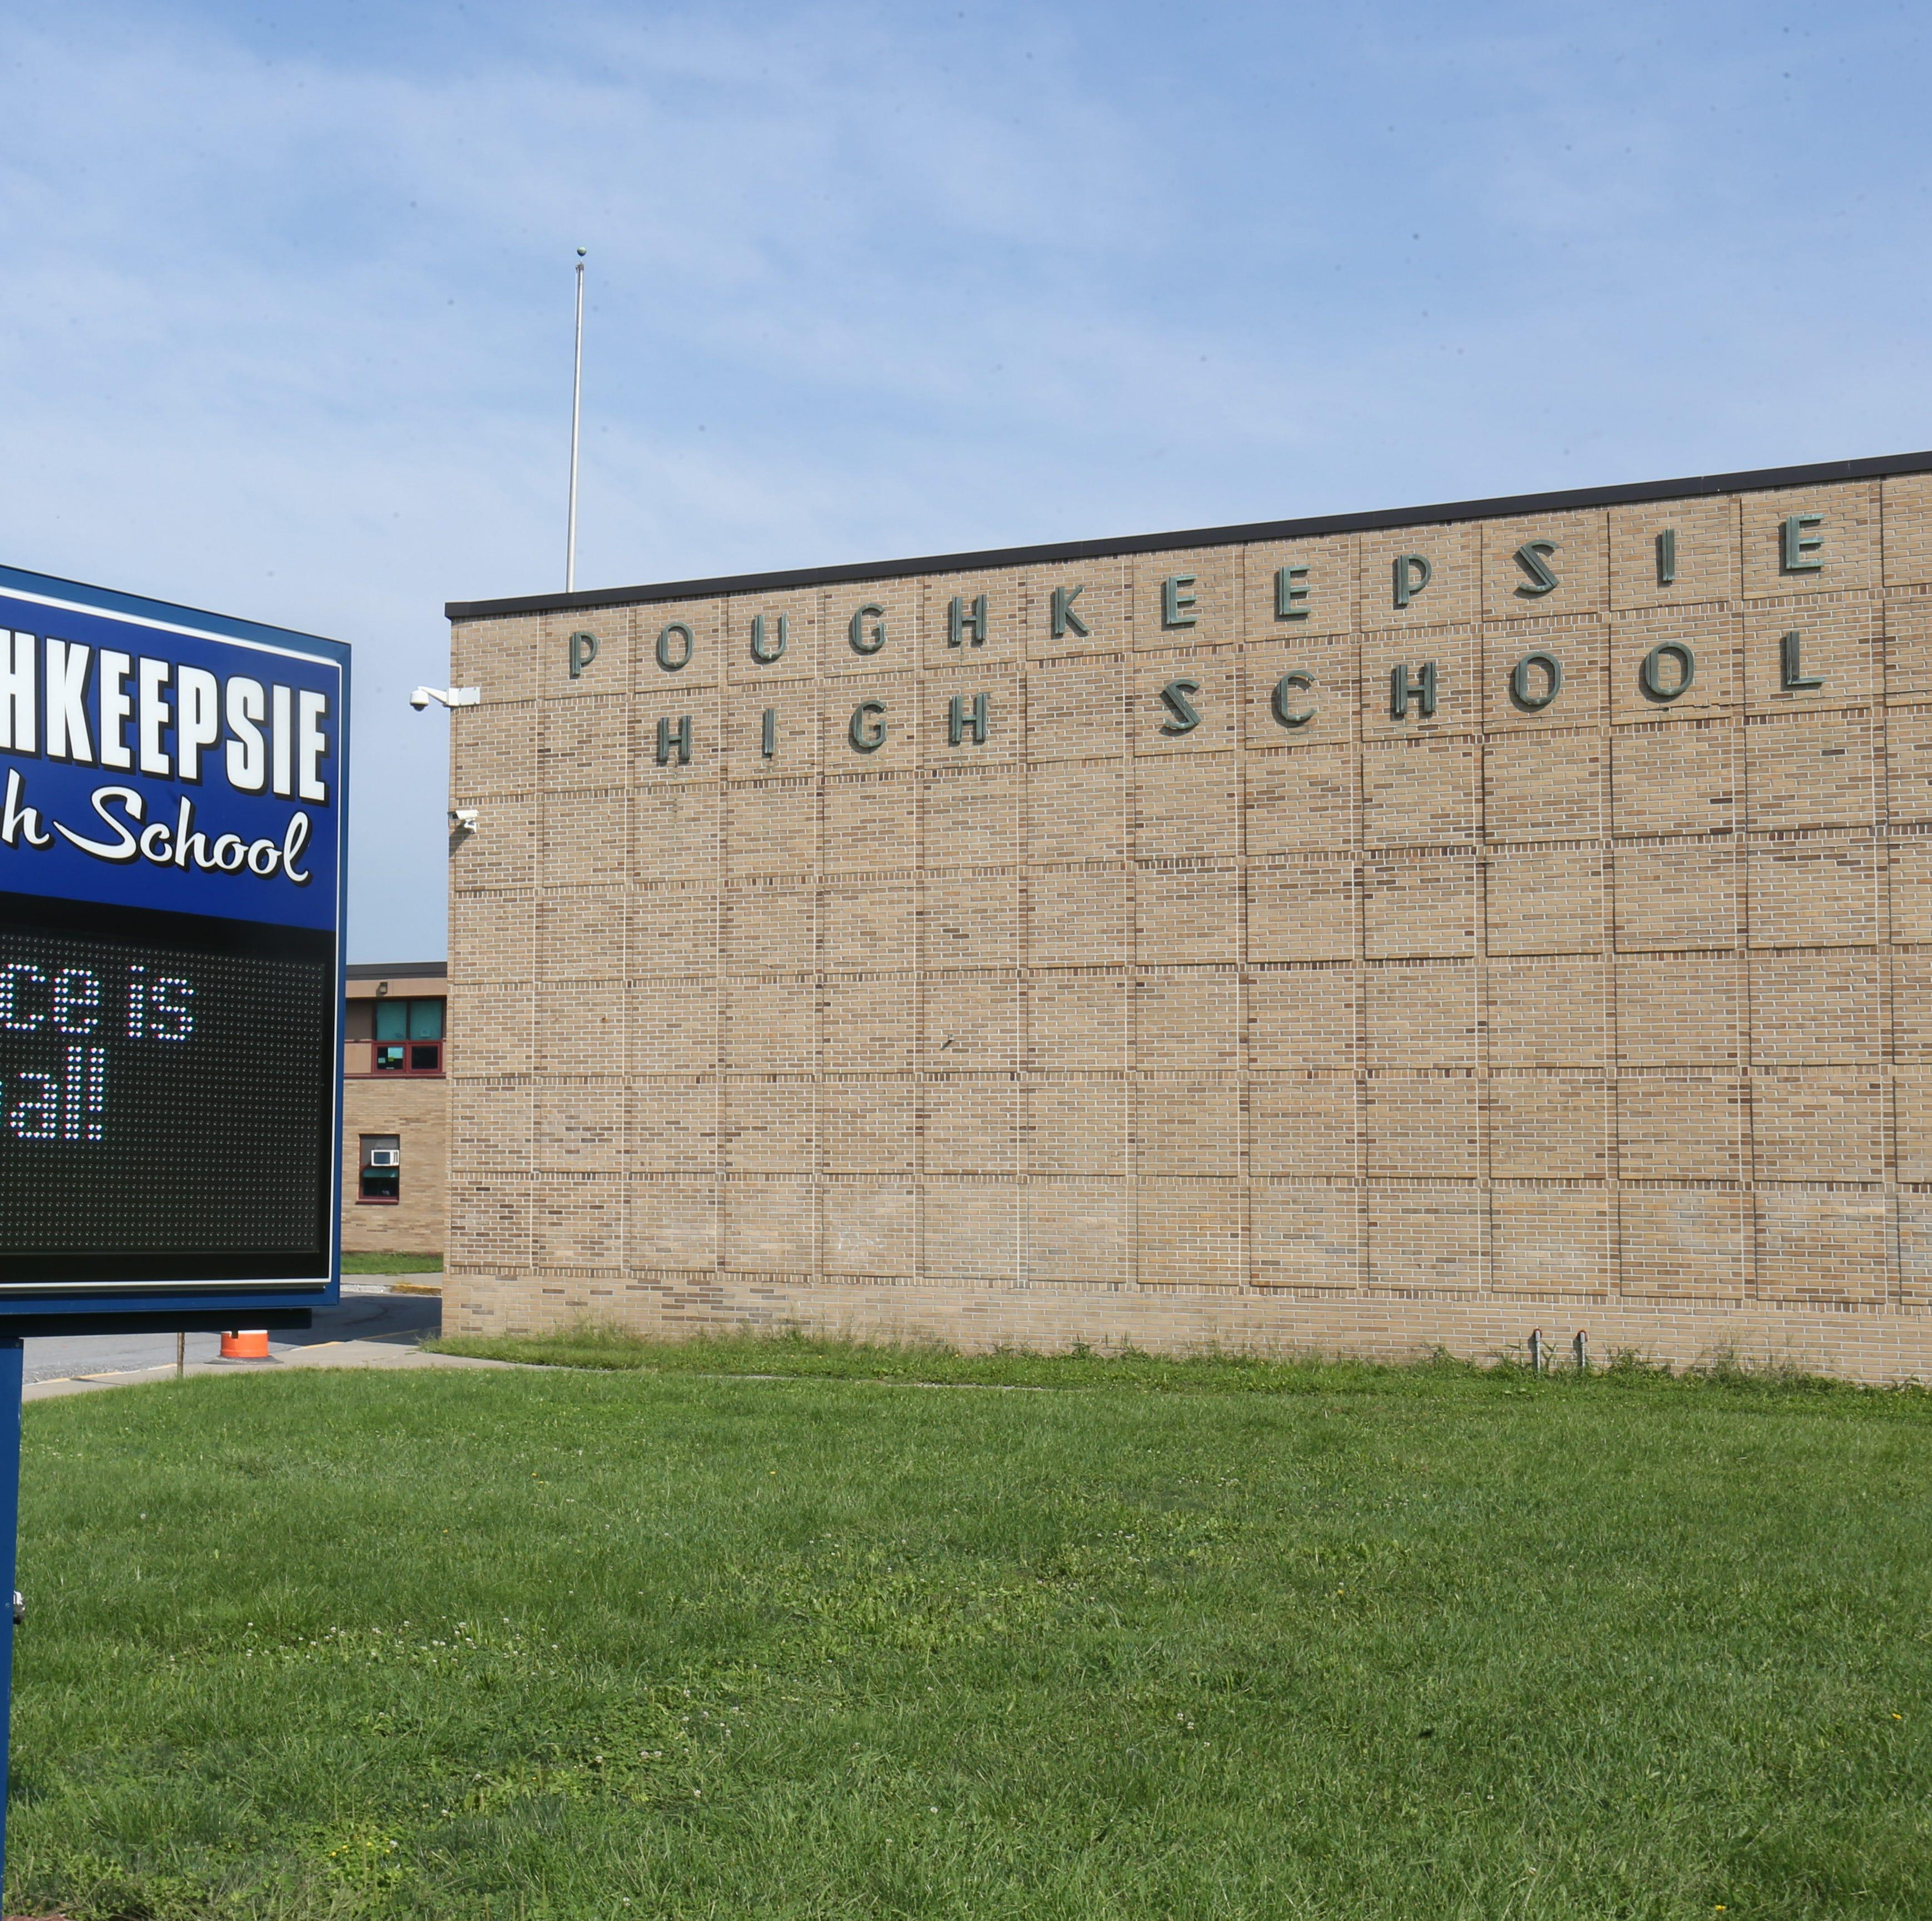 Poughkeepsie High School on August 28, 2018.